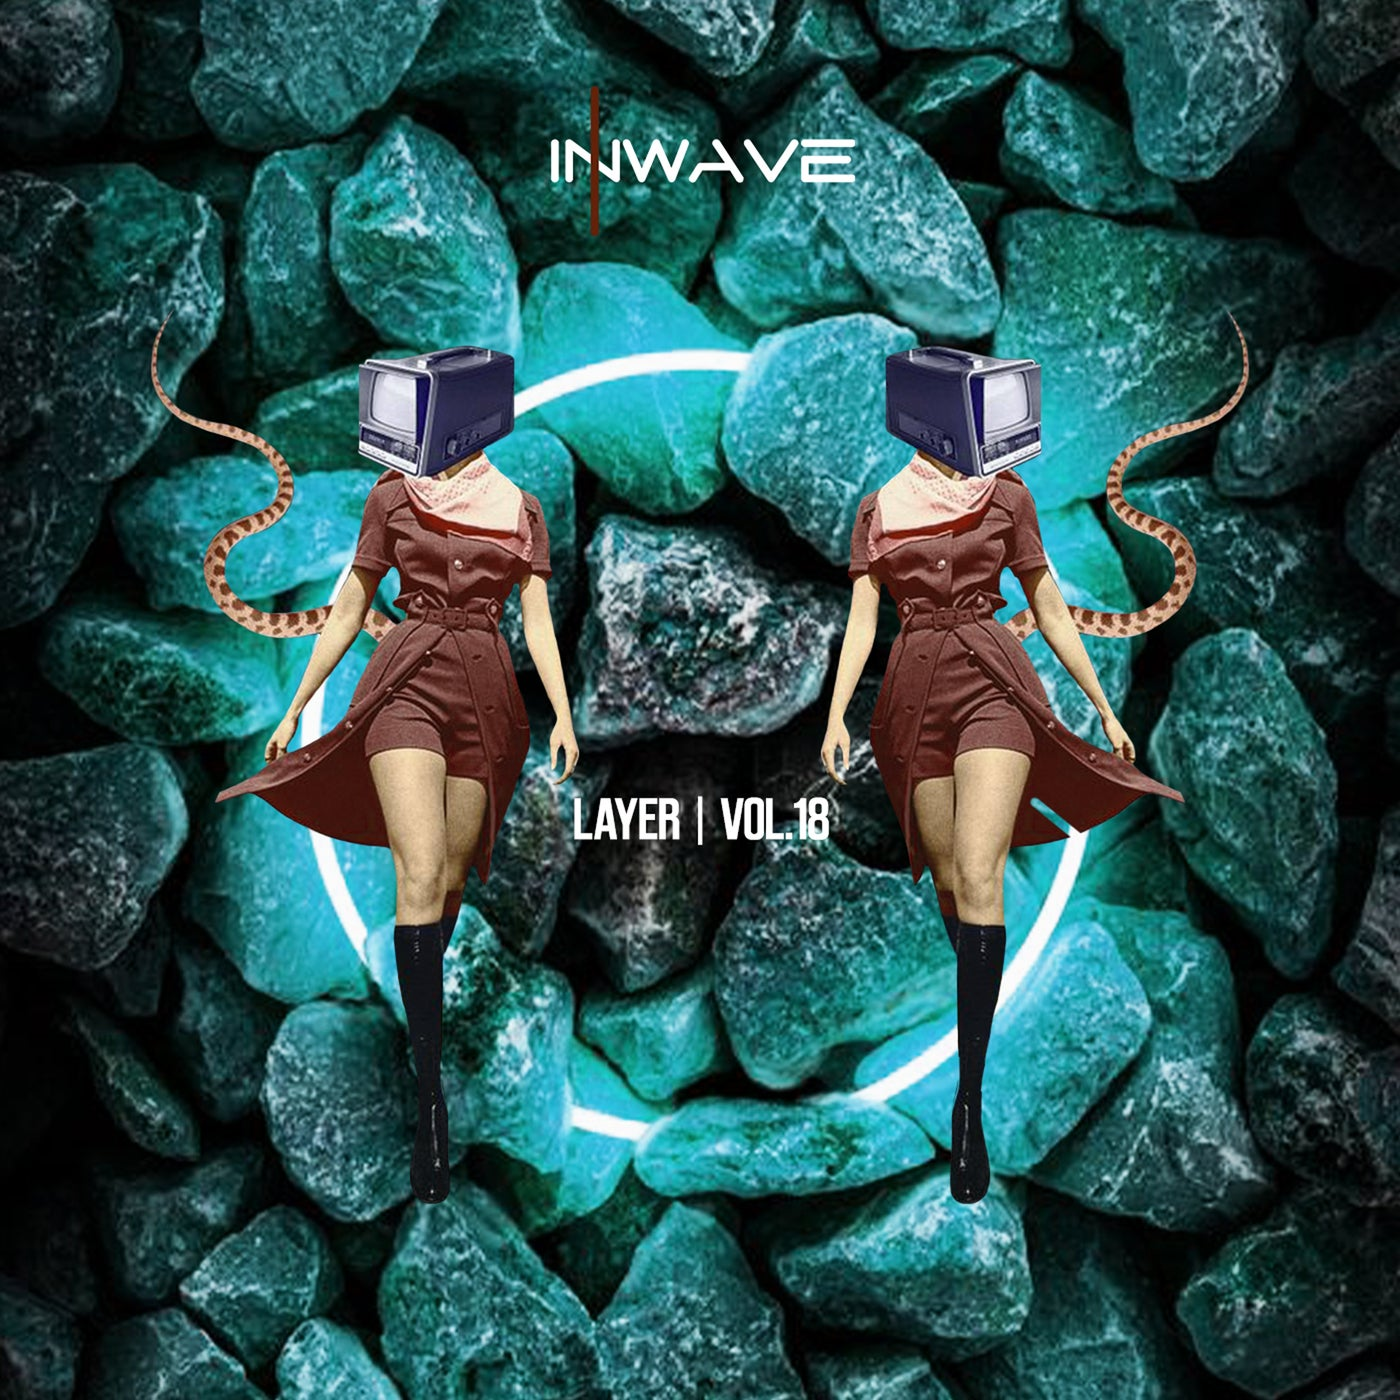 Inwave Layer Vol.18